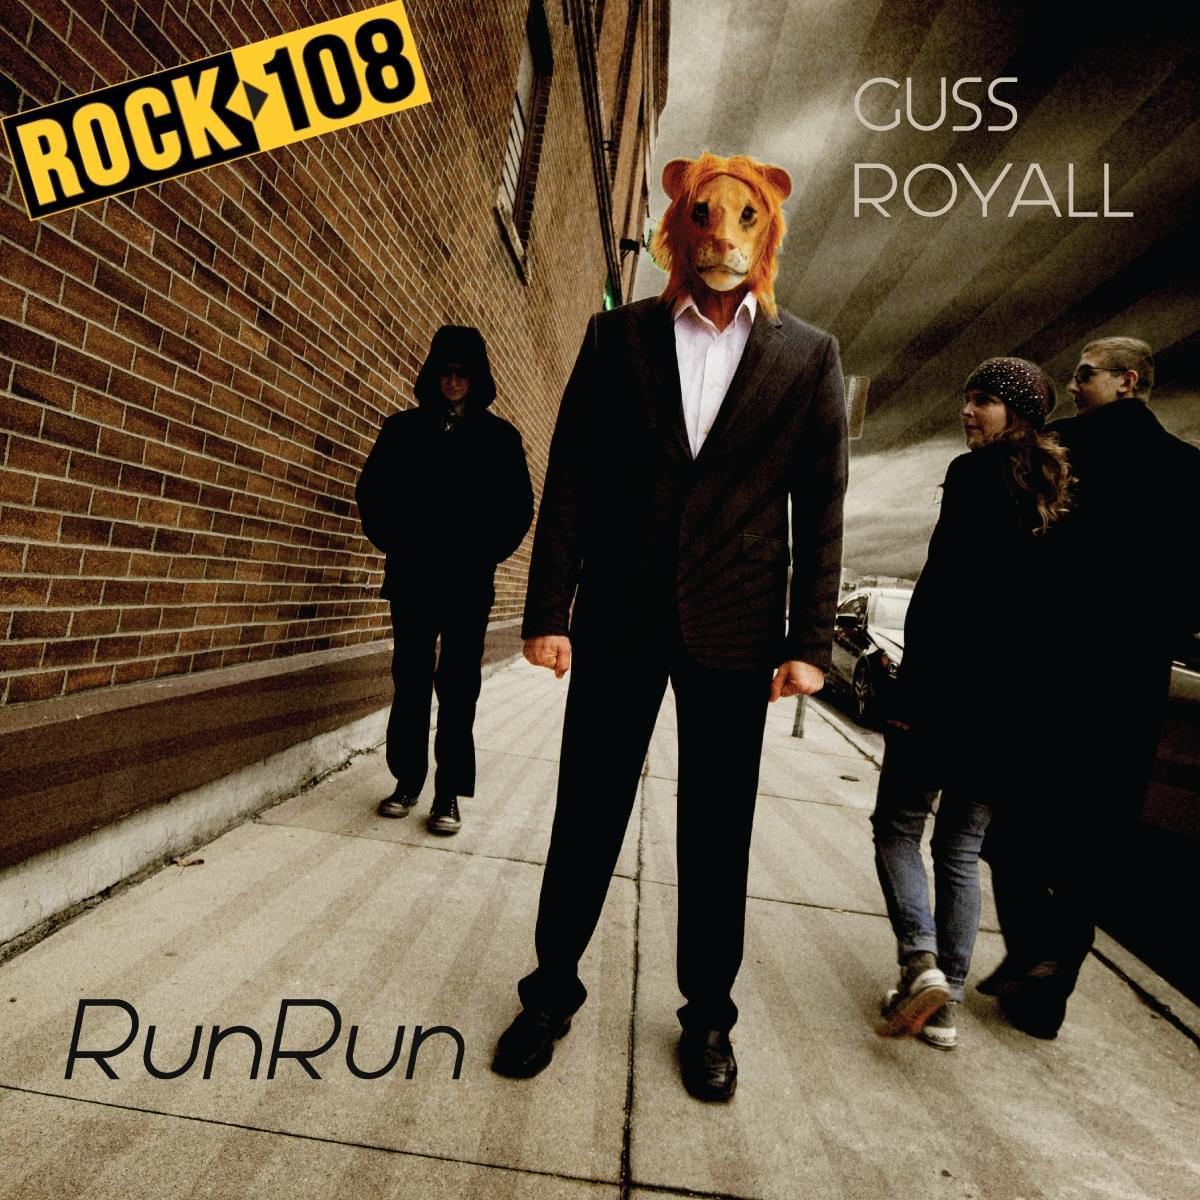 rock108gussroyall